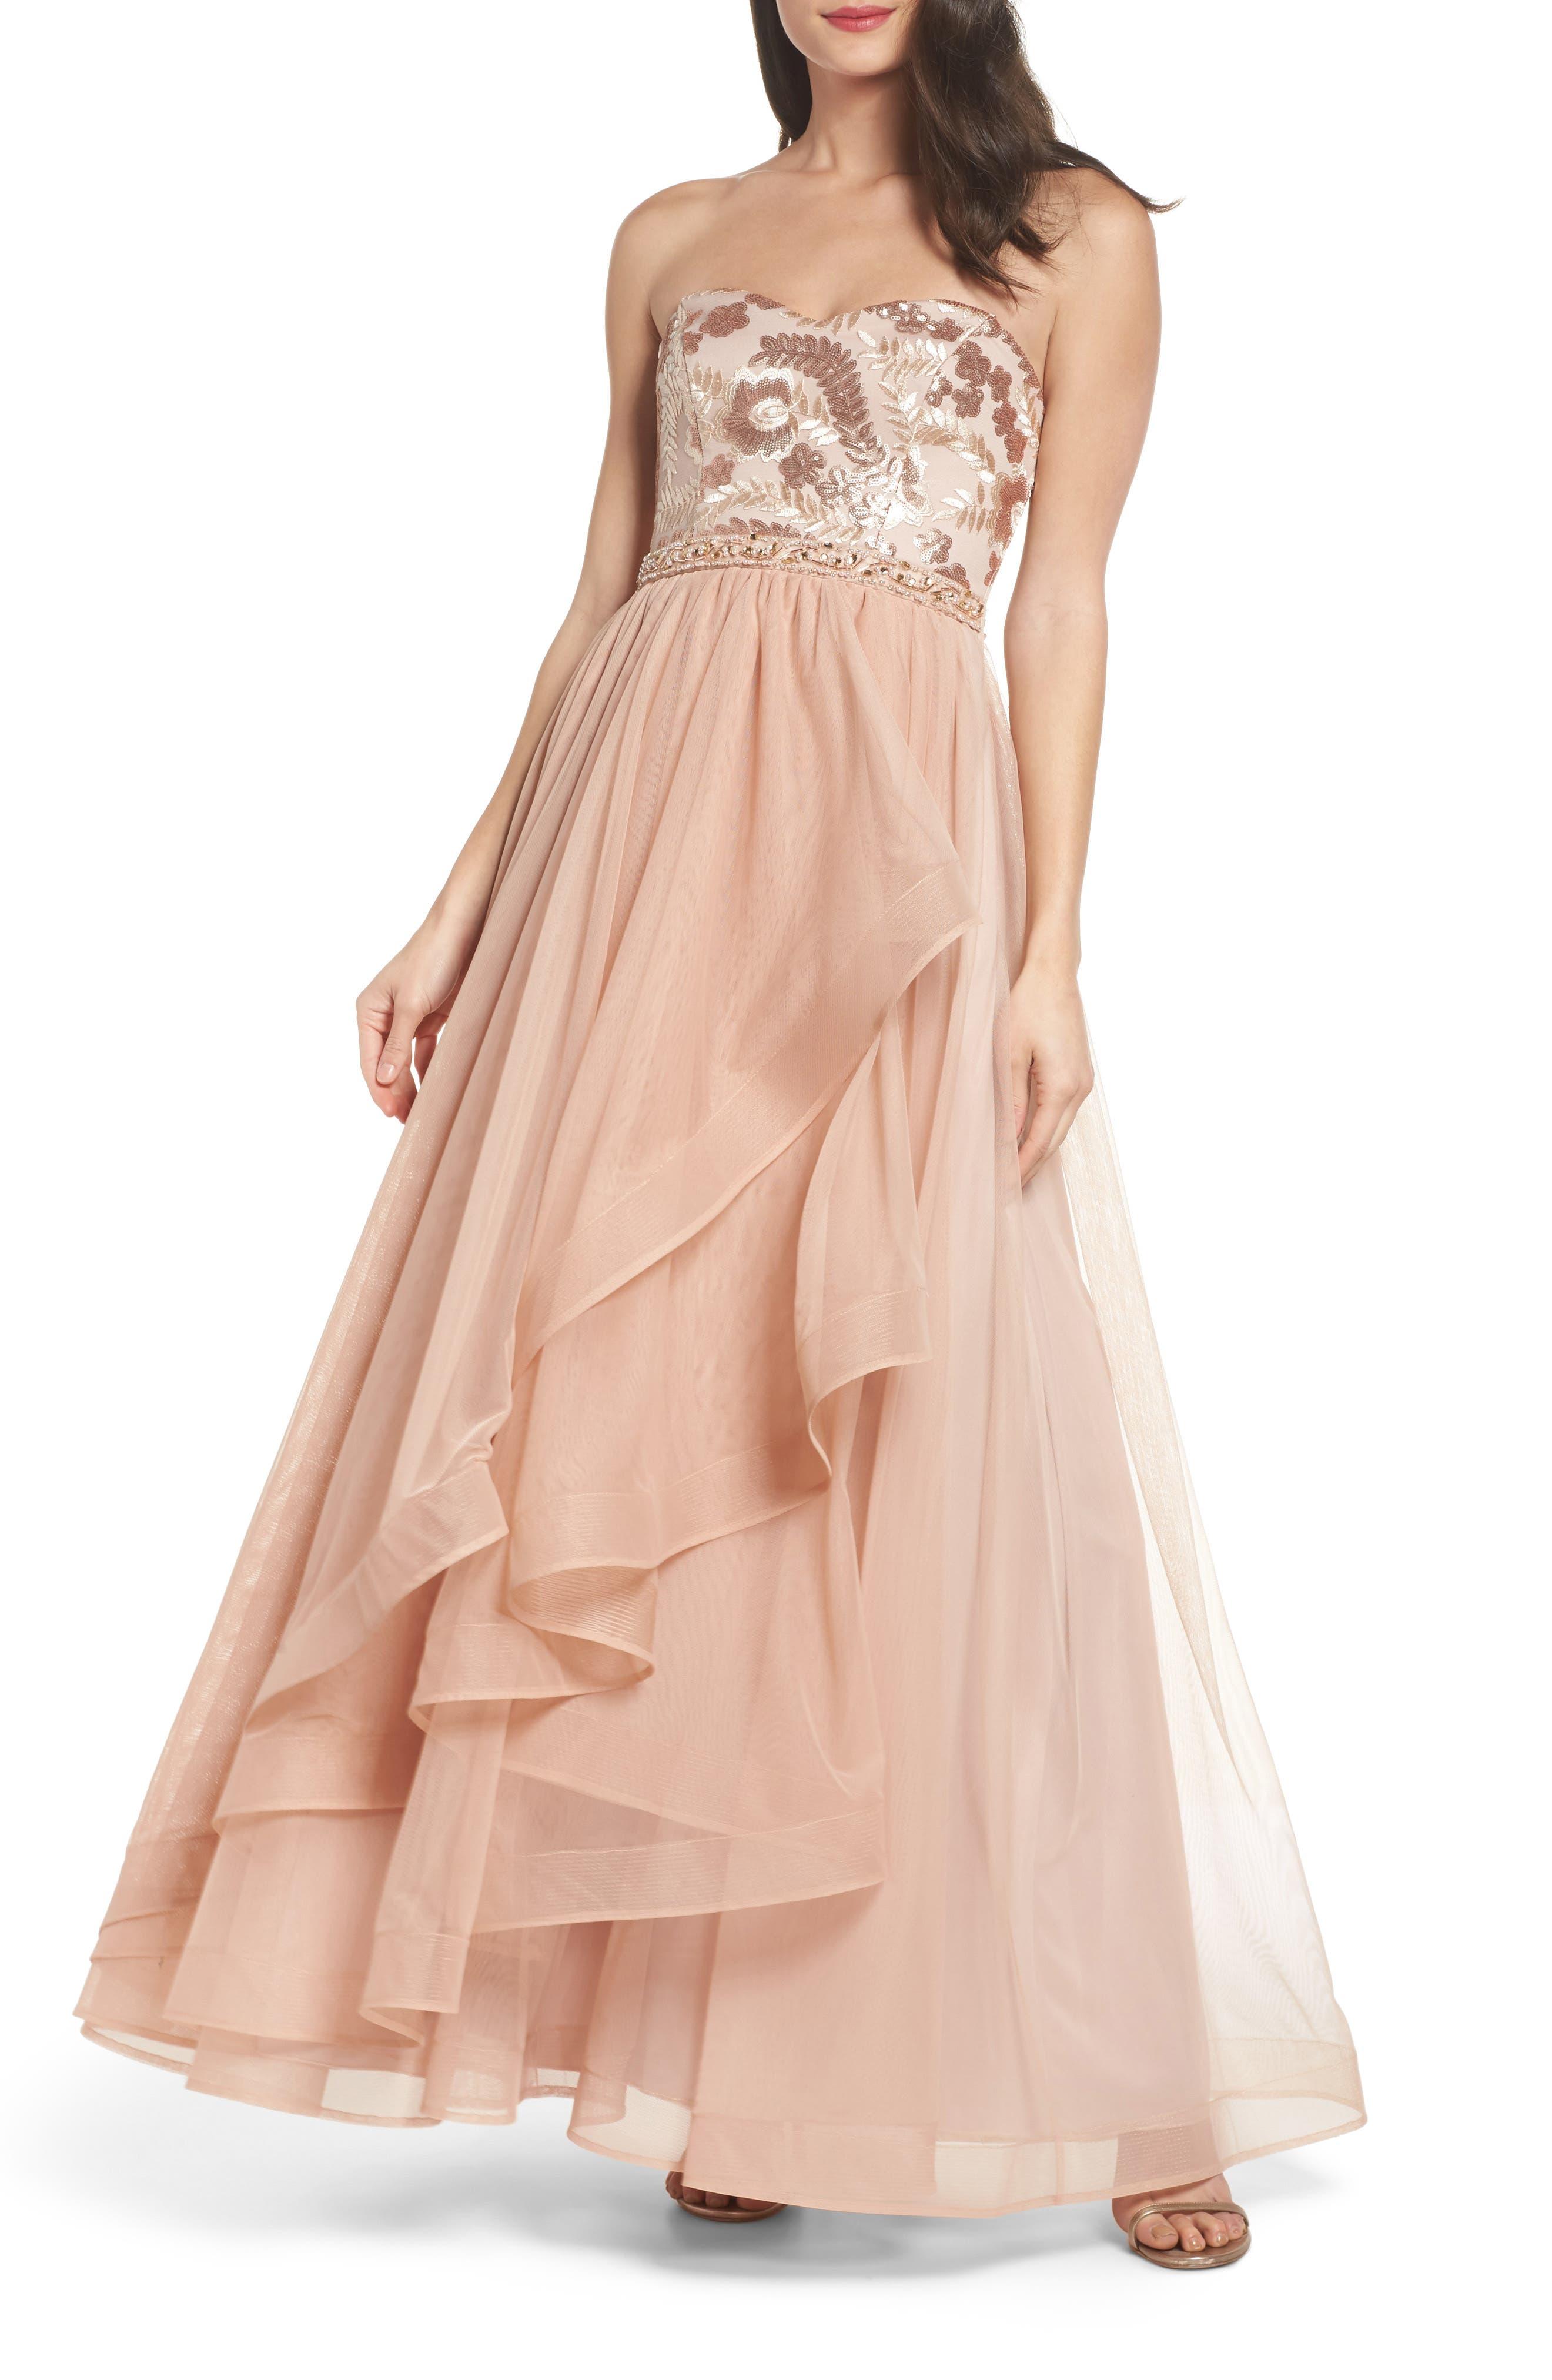 Sequin Hearts Strapless Sequin Bodice Ballgown